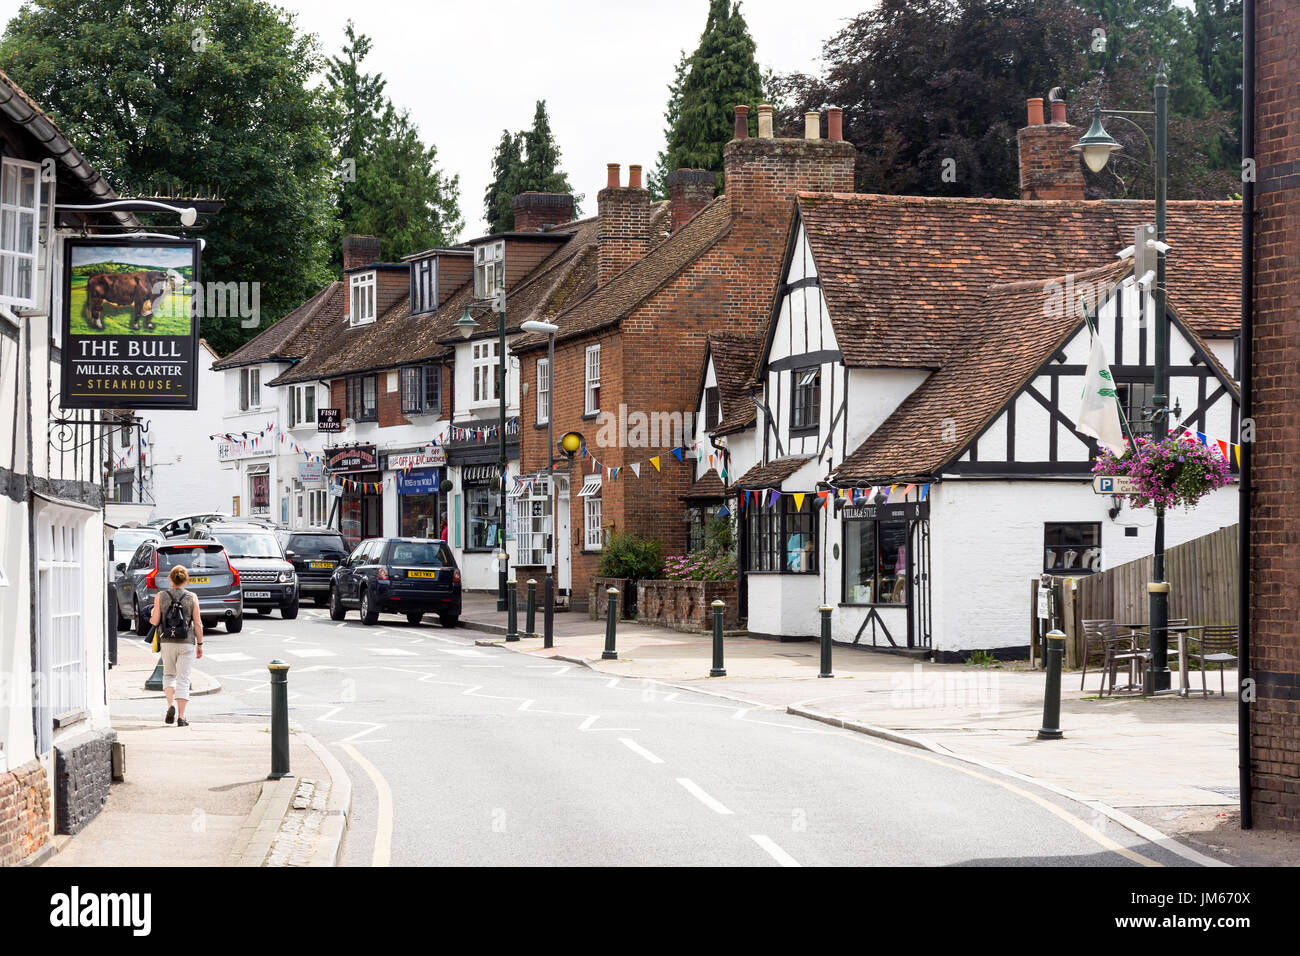 High Street, Wheathampstead, Hertfordshire, England, United Kingdom - Stock Image